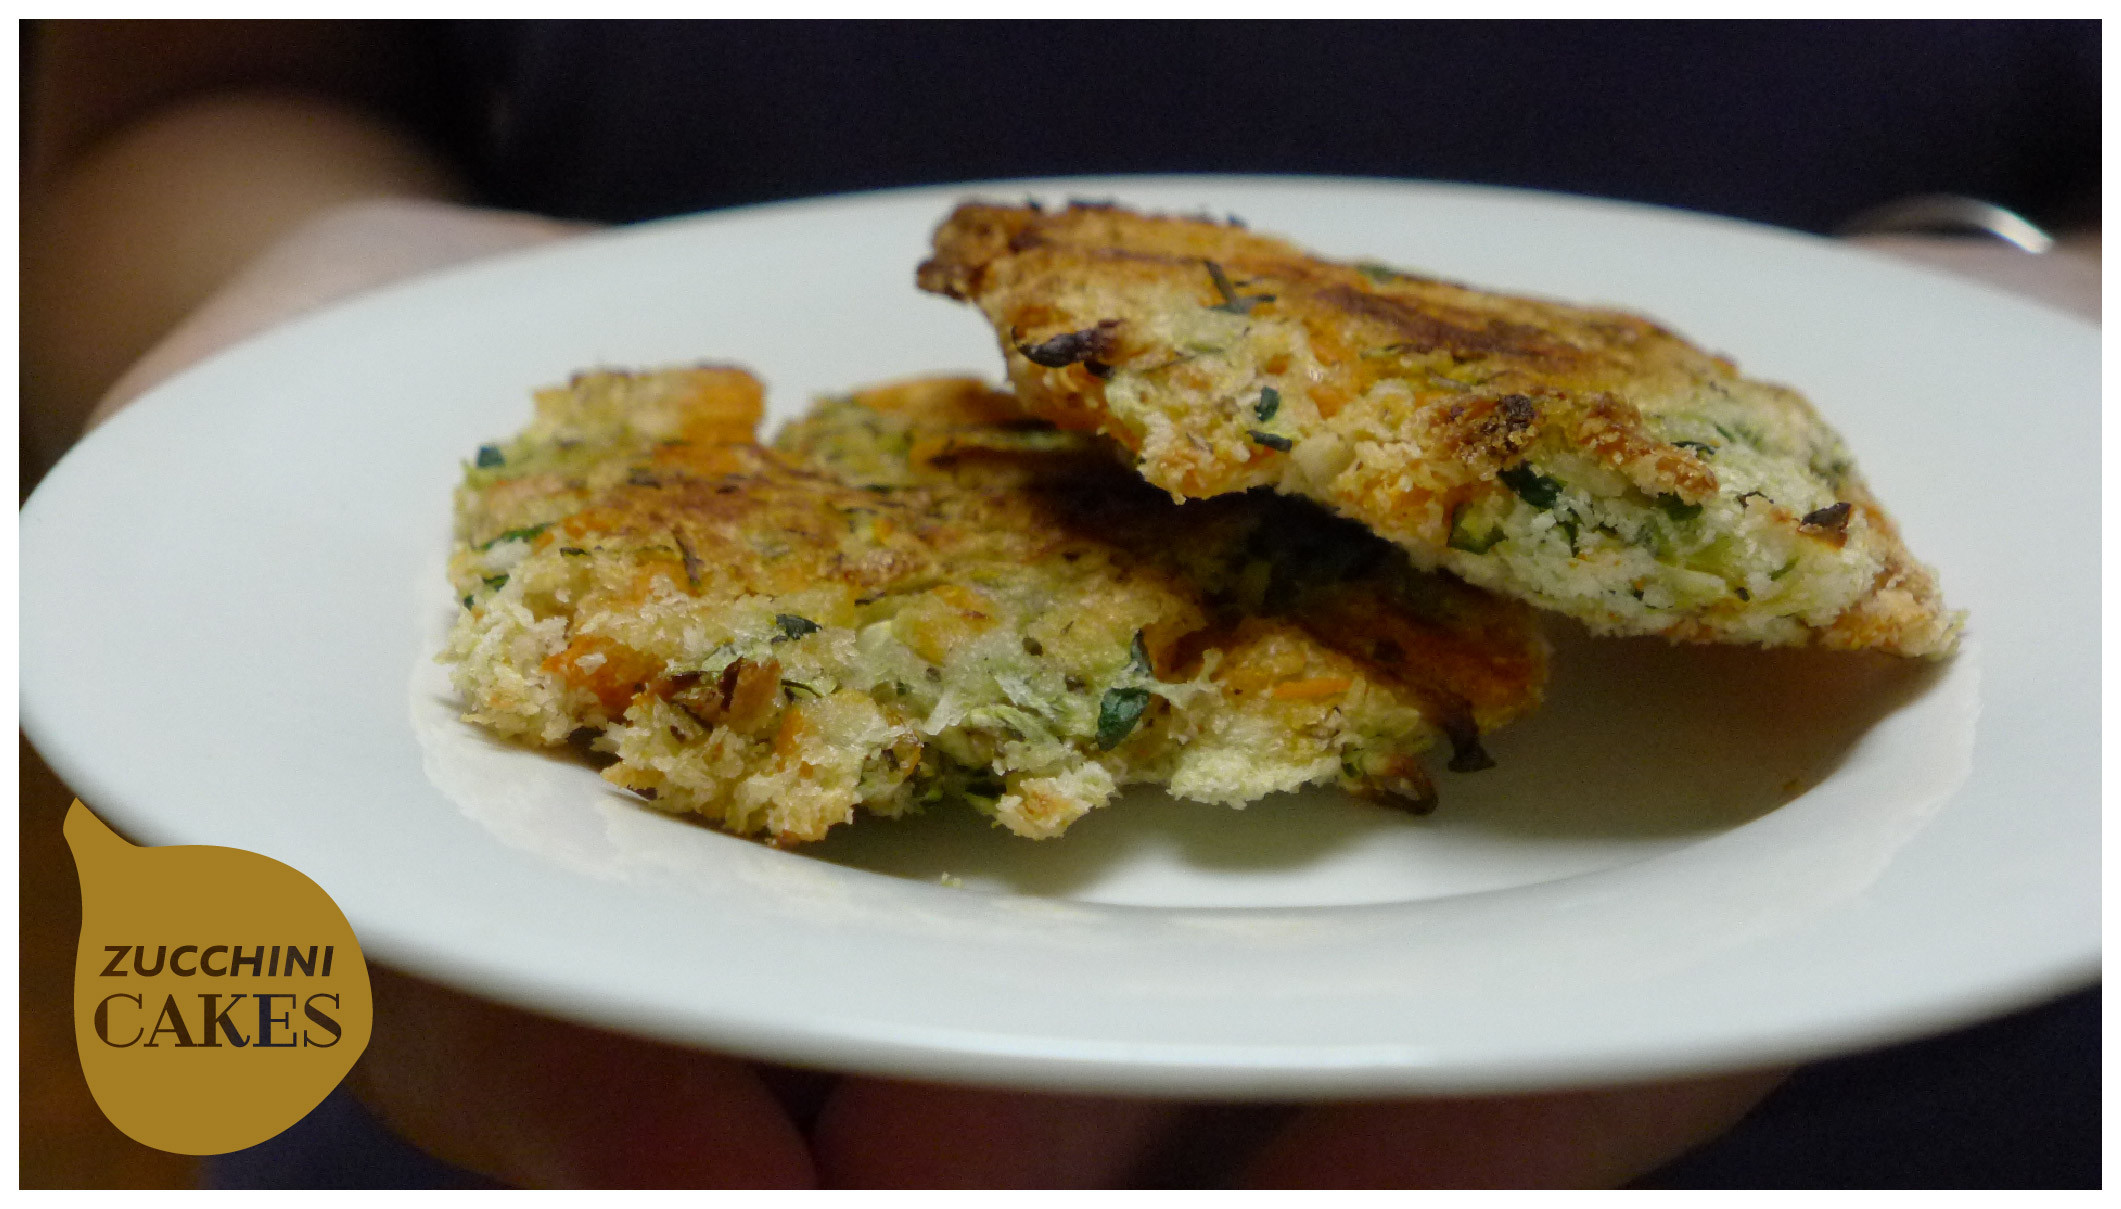 Healthy Zucchini Cake Recipe  Healthy Hostess Zucchini Cake Recipe — OhCarlene